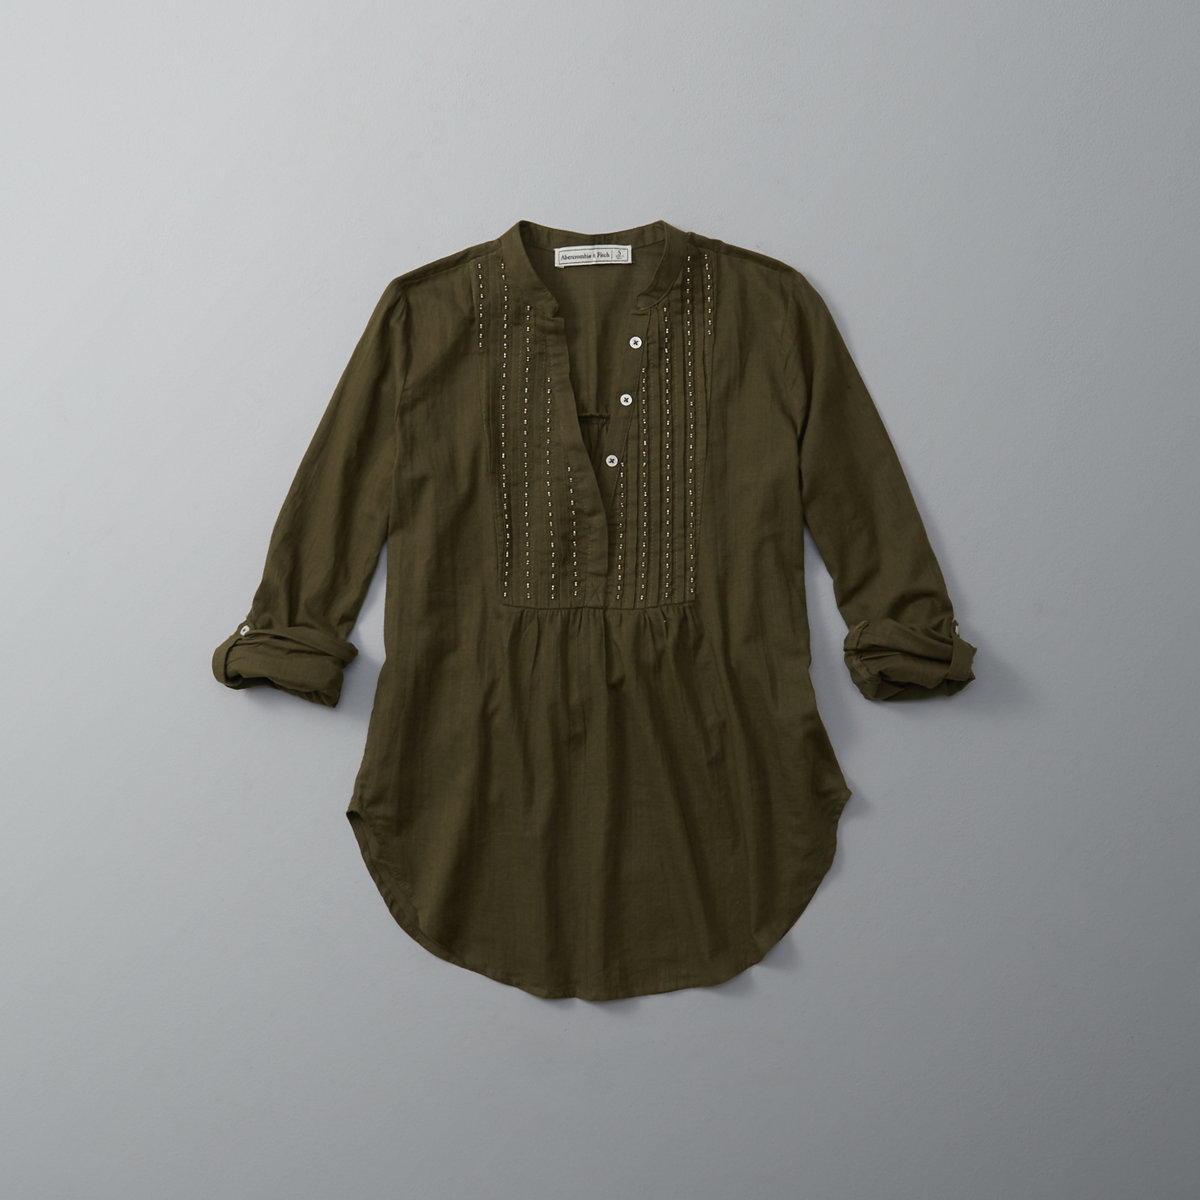 Embellished Bib Peasant Top